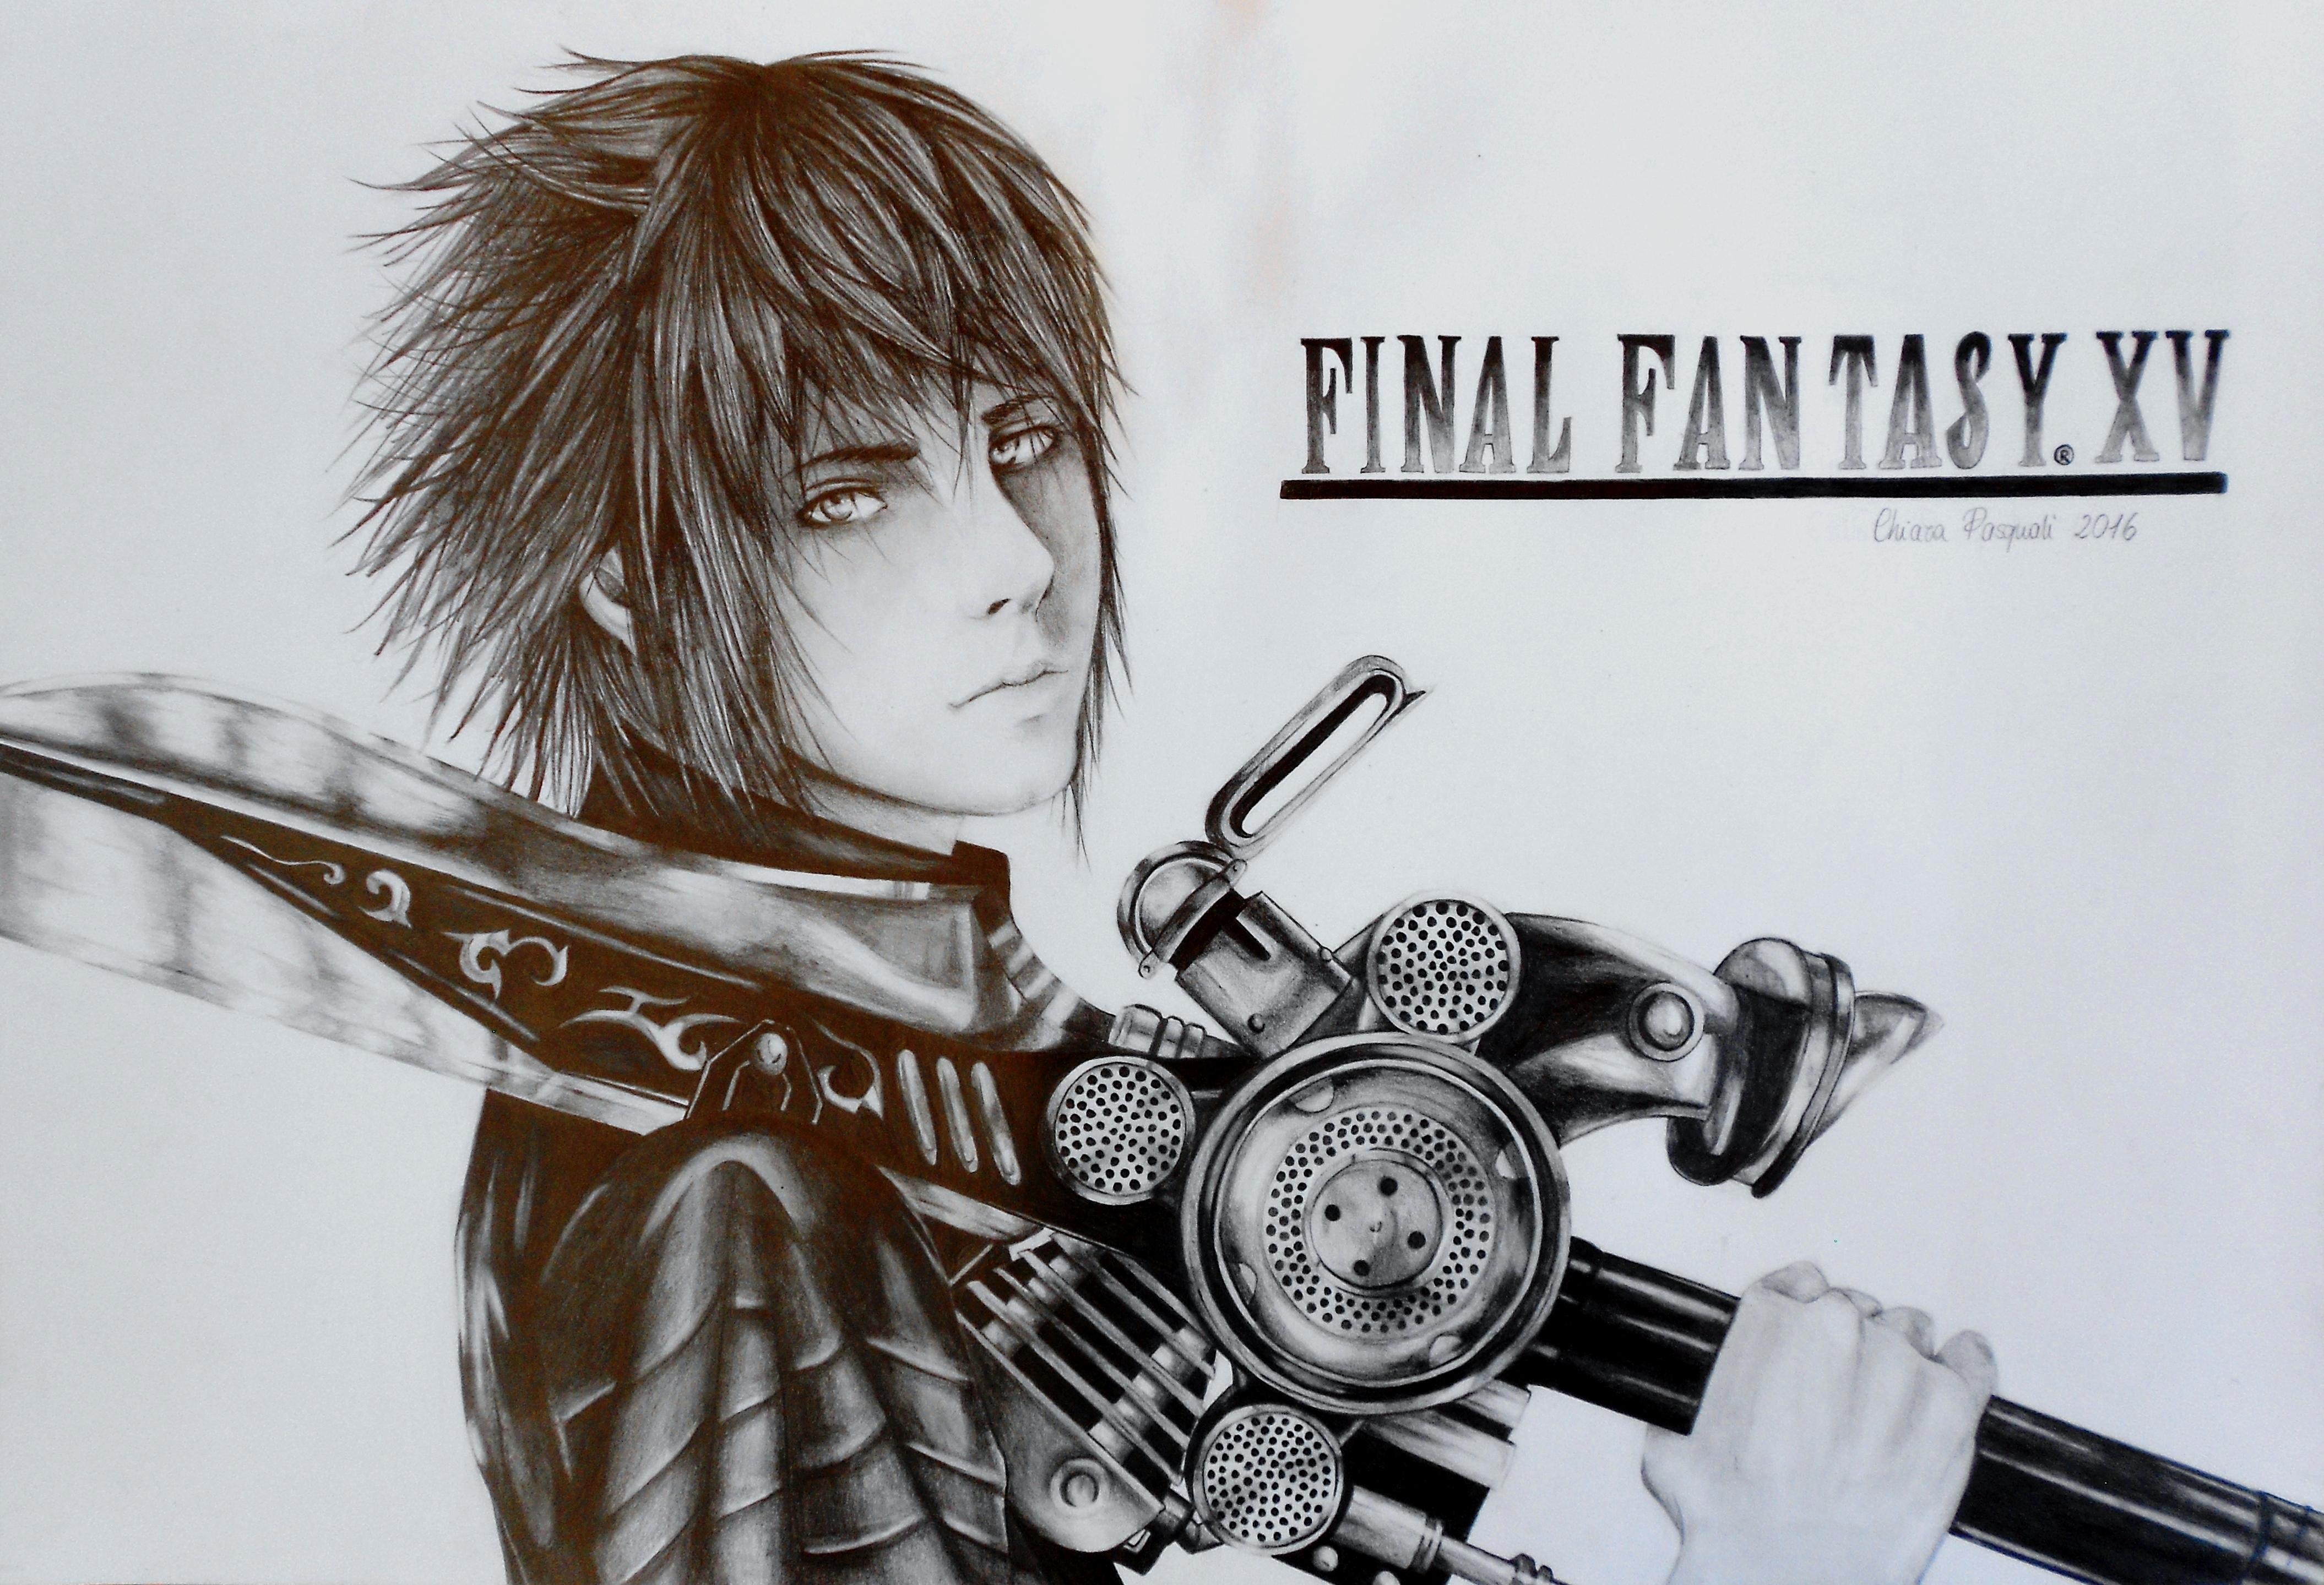 My Prince Noctis Lucis Caelum - Final Fantasy XV by ElectroChiara